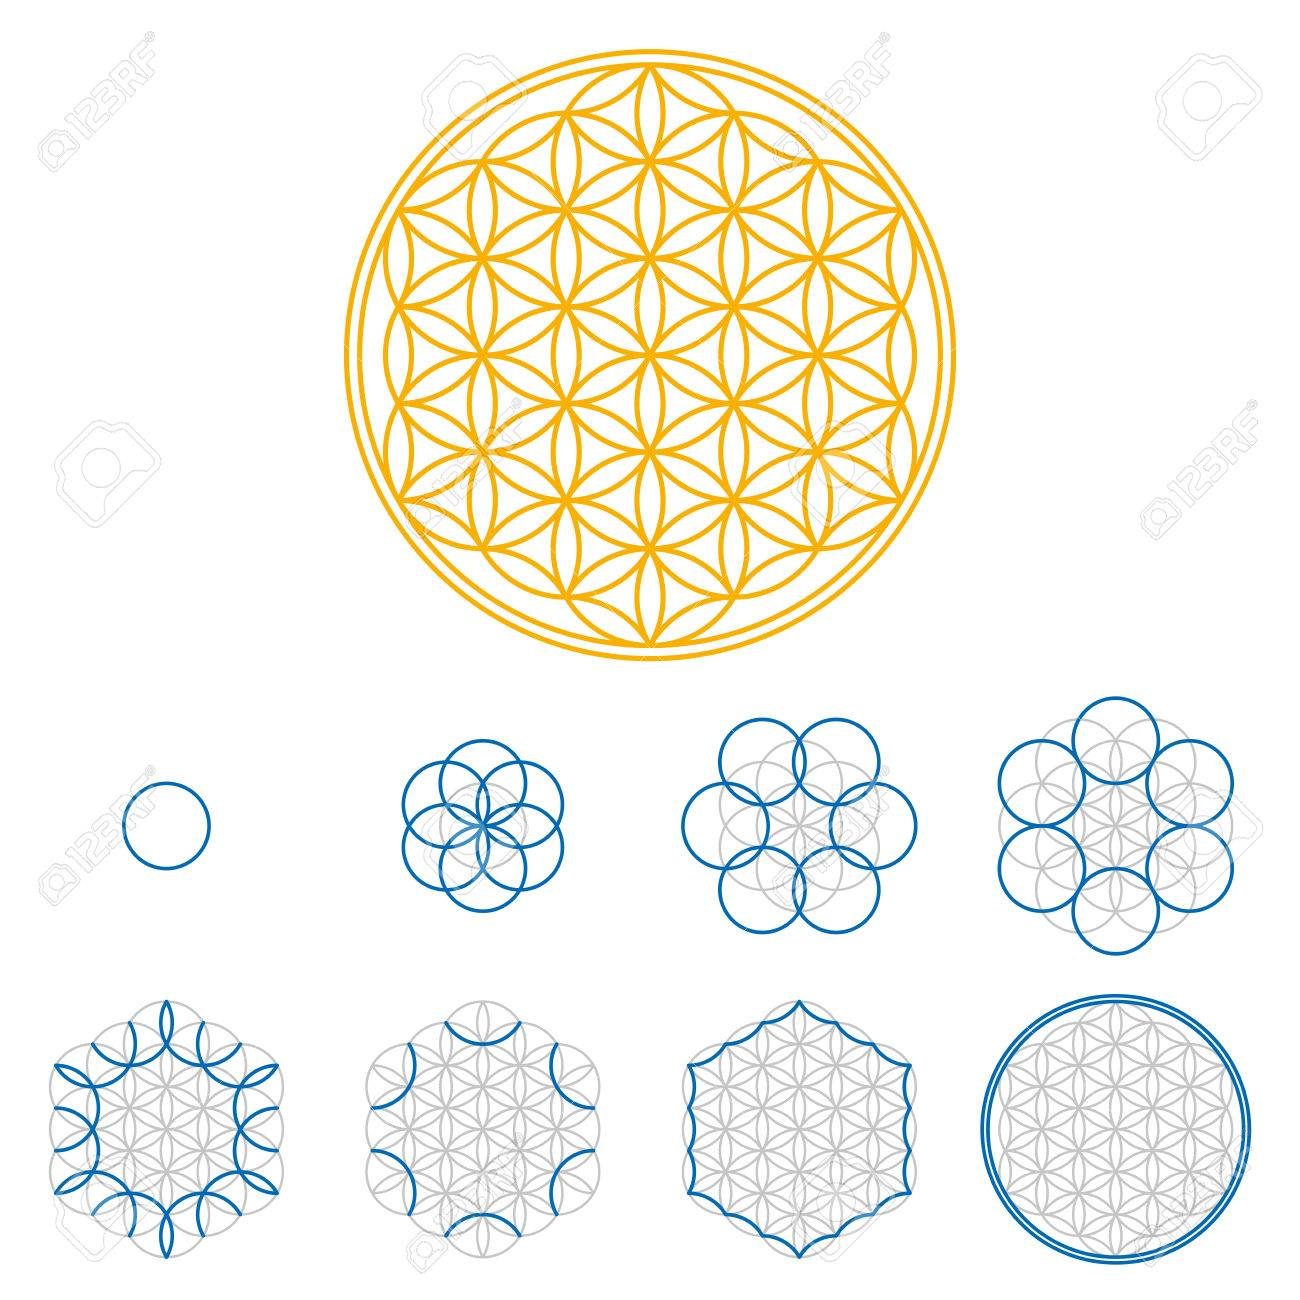 colored flower of life development an ancient symmetrical symbol